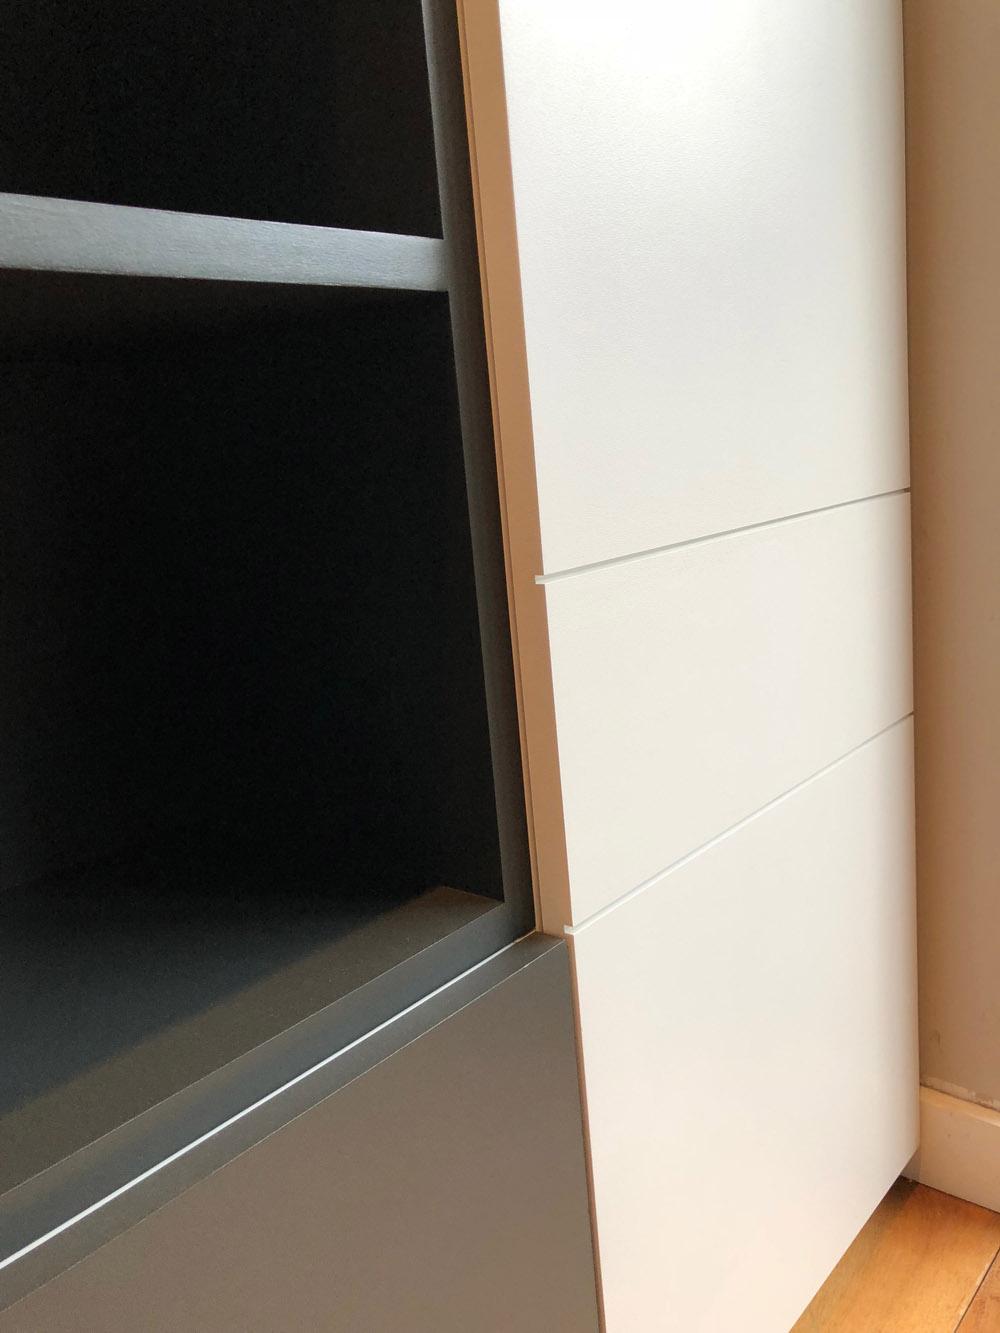 GW-Cabinetry-Interior-Solutions-Media-Cabinets-3.jpg